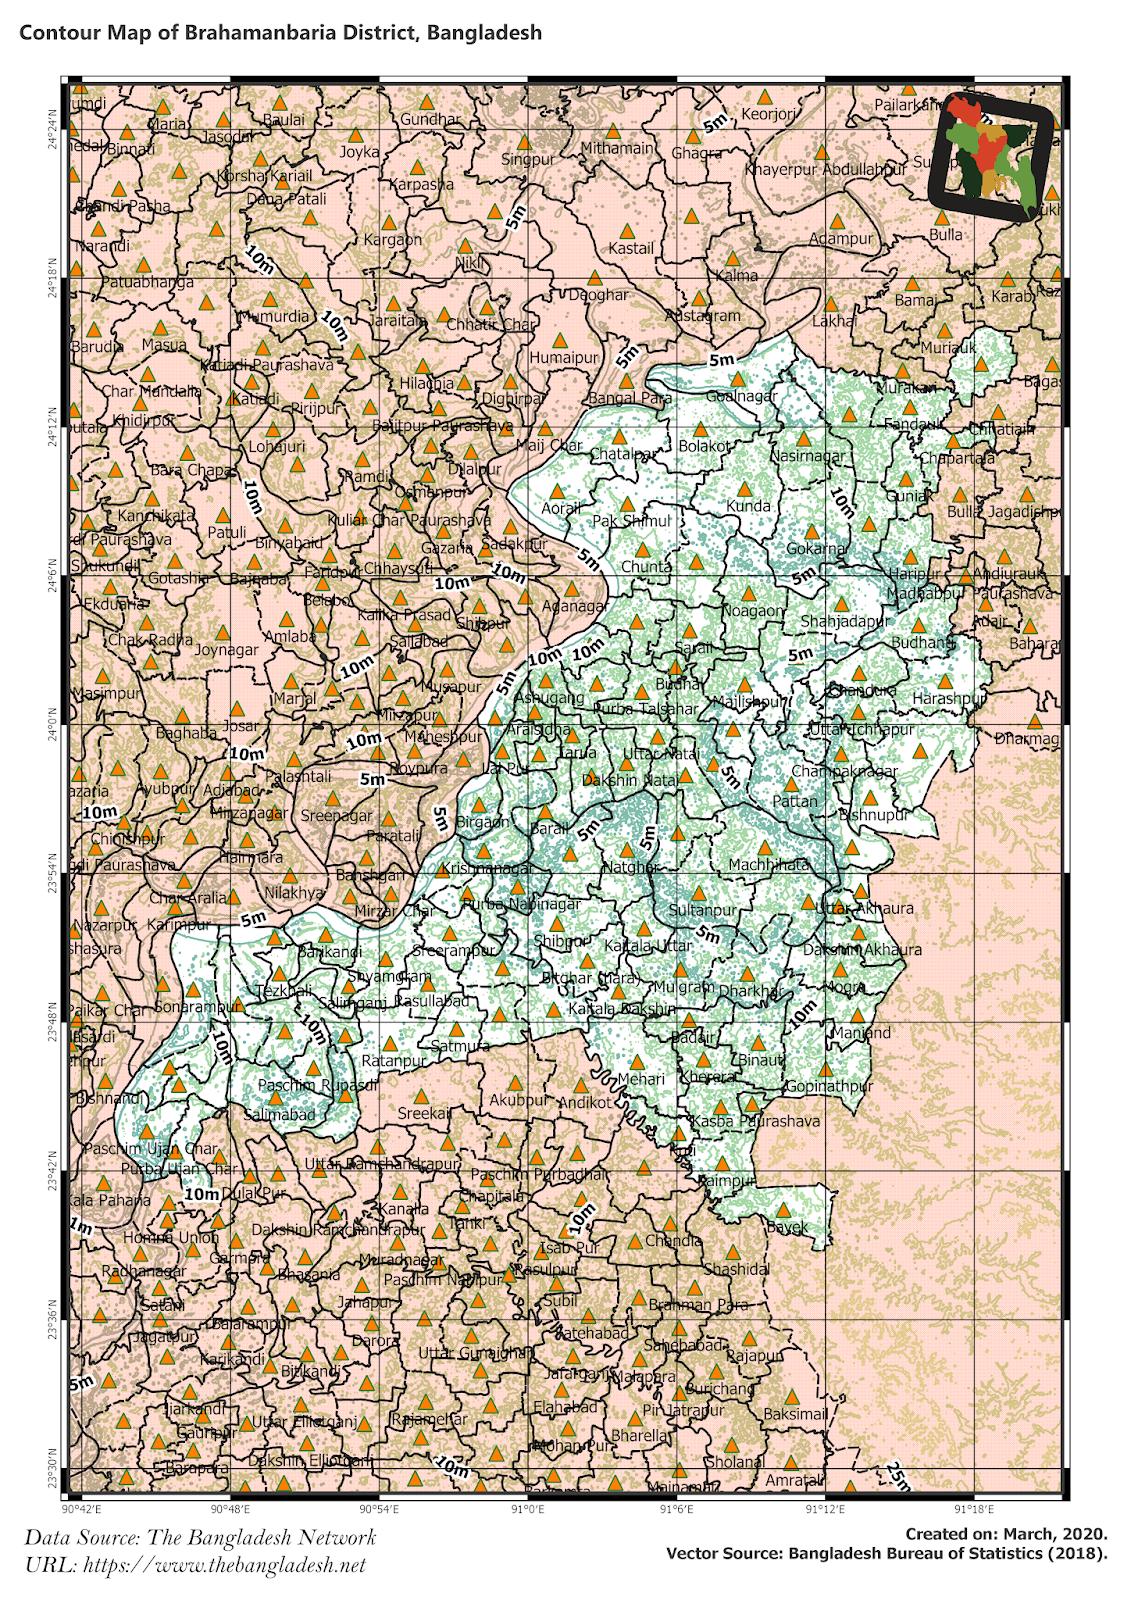 Elevation Map of Brahmanbaria District of Bangladesh